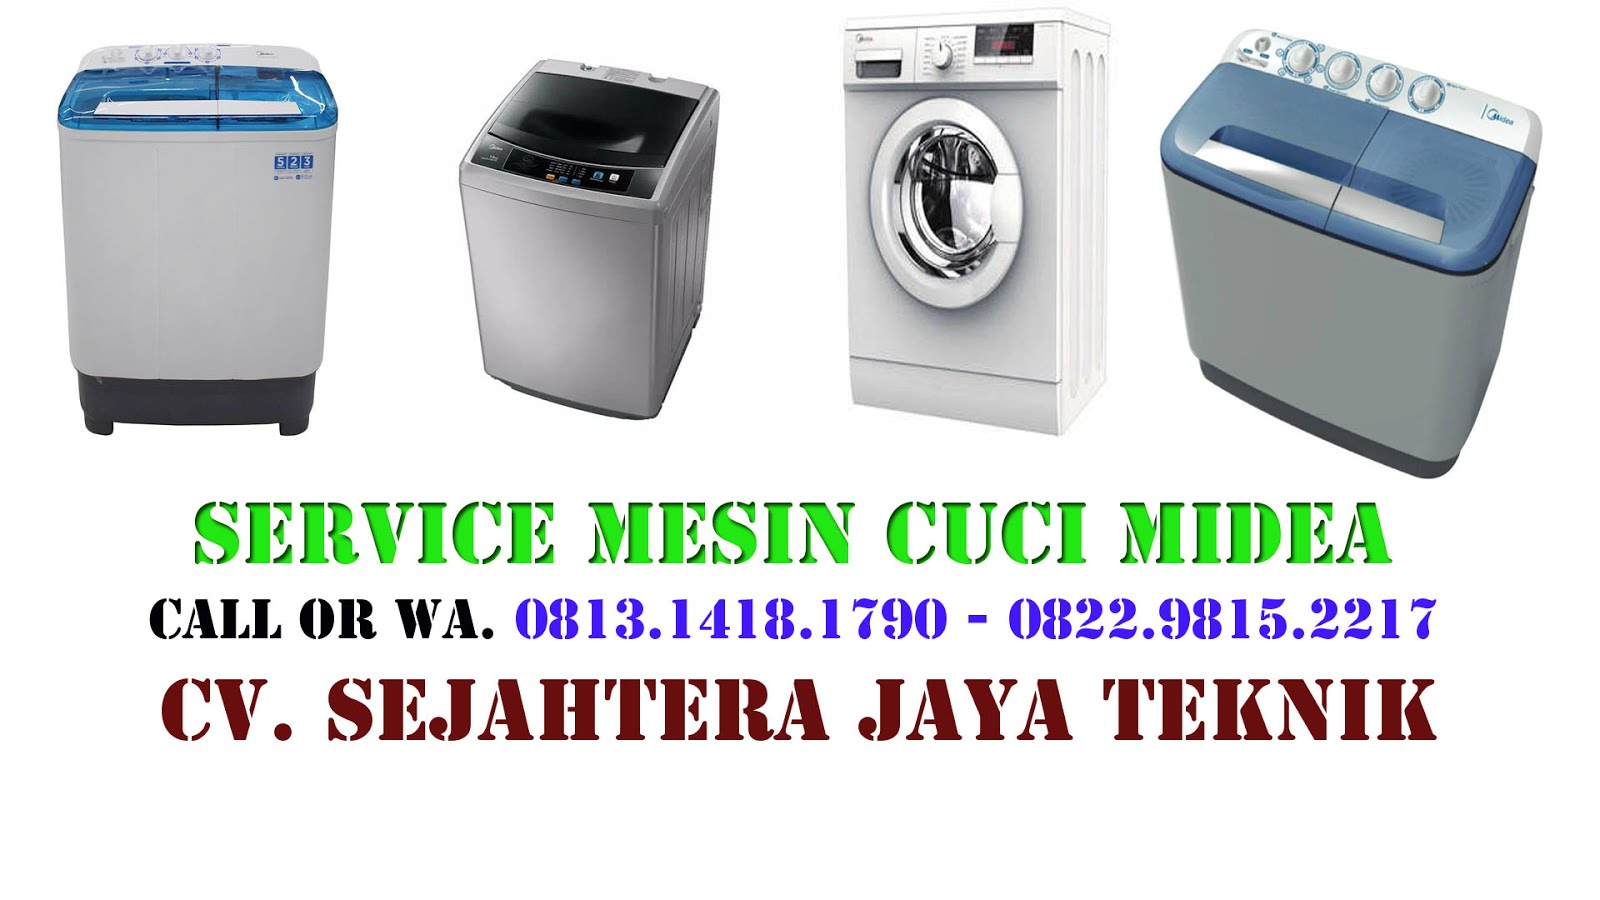 Service Mesin Cuci Midea di Jakarta Selatan